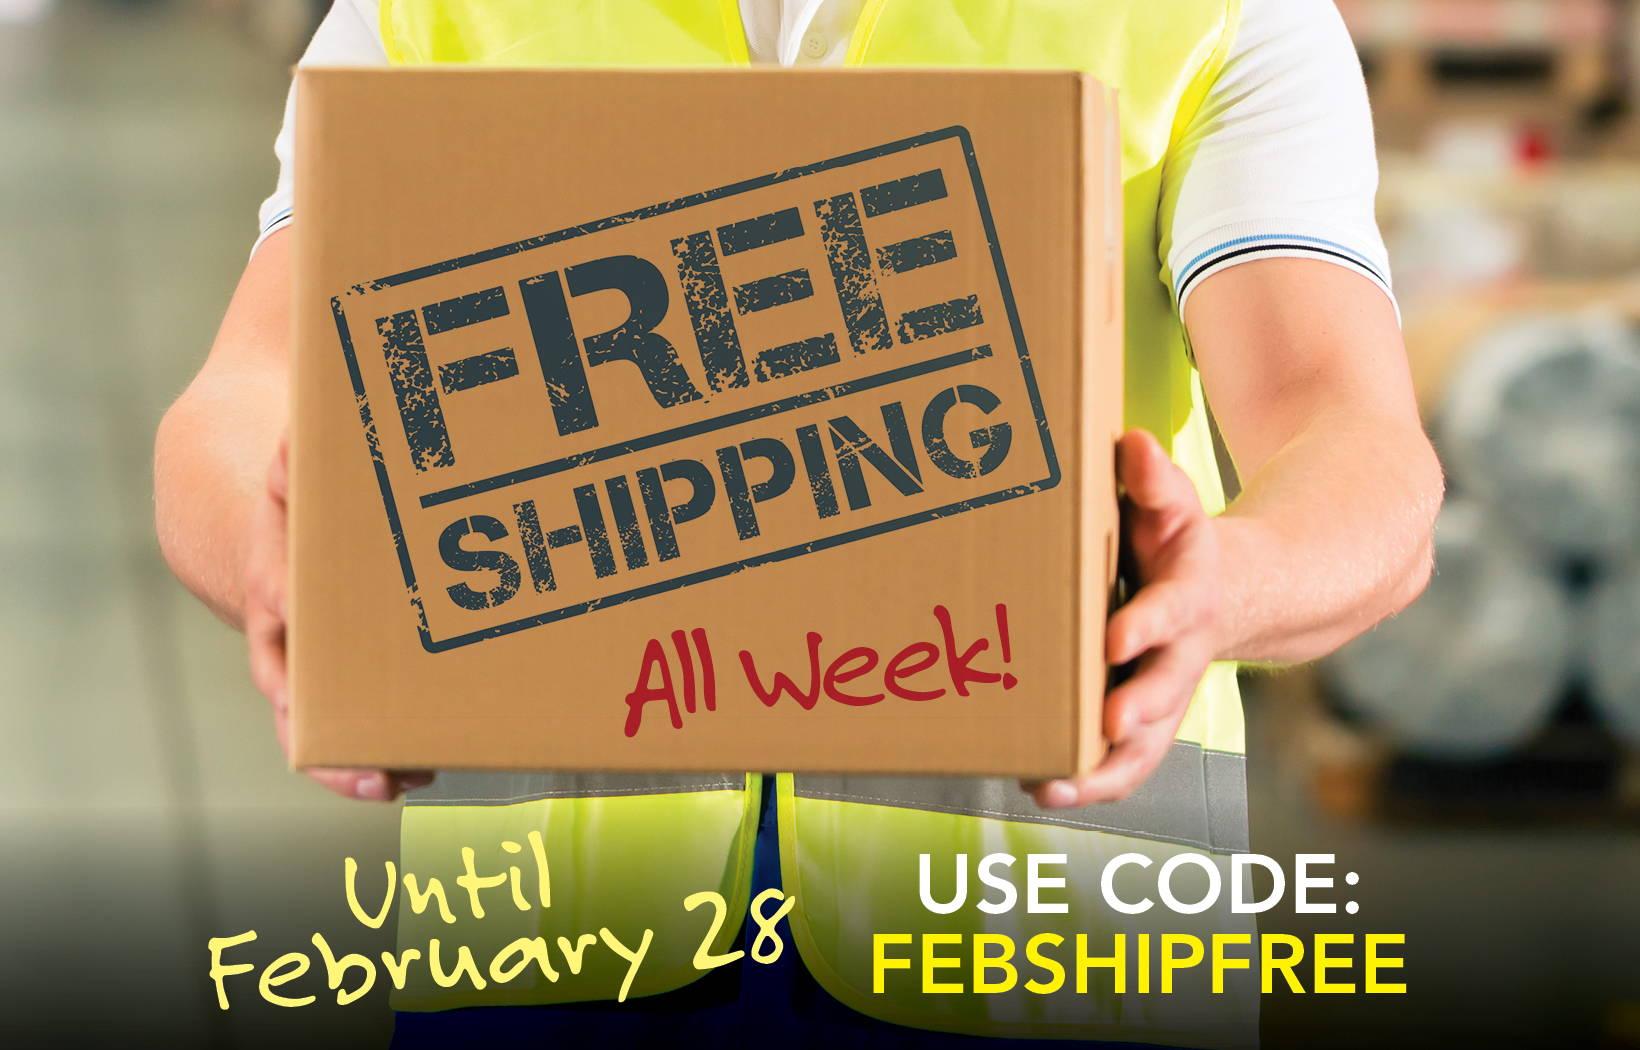 Free Shipping Week - Promo code FEBSHIPFREE